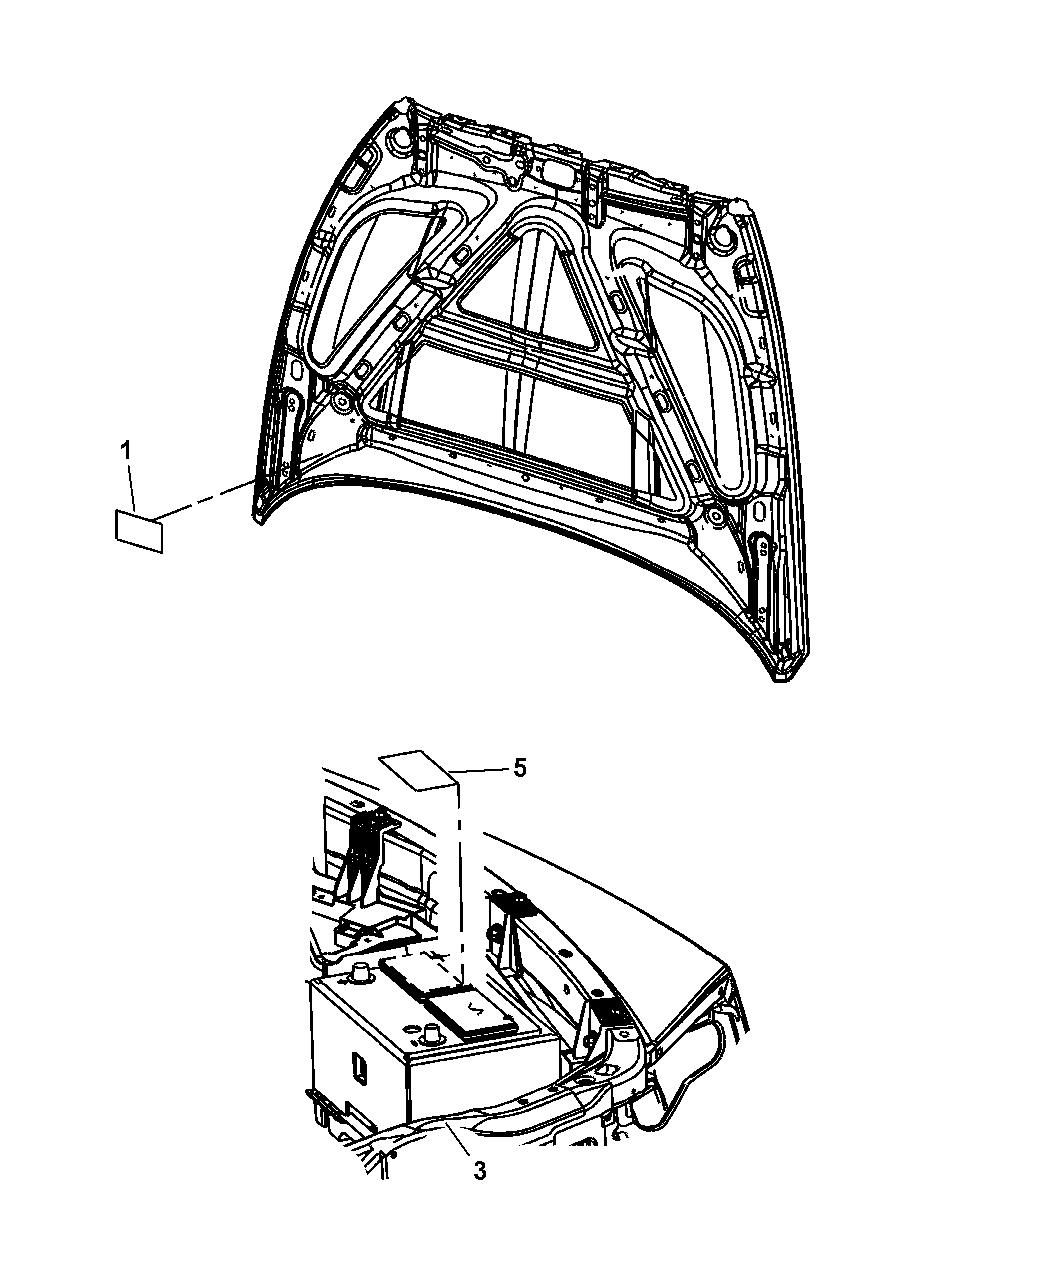 2007 Dodge Dakota Quad Cab Speaker Box Auto Electrical Wiring Diagram Related With